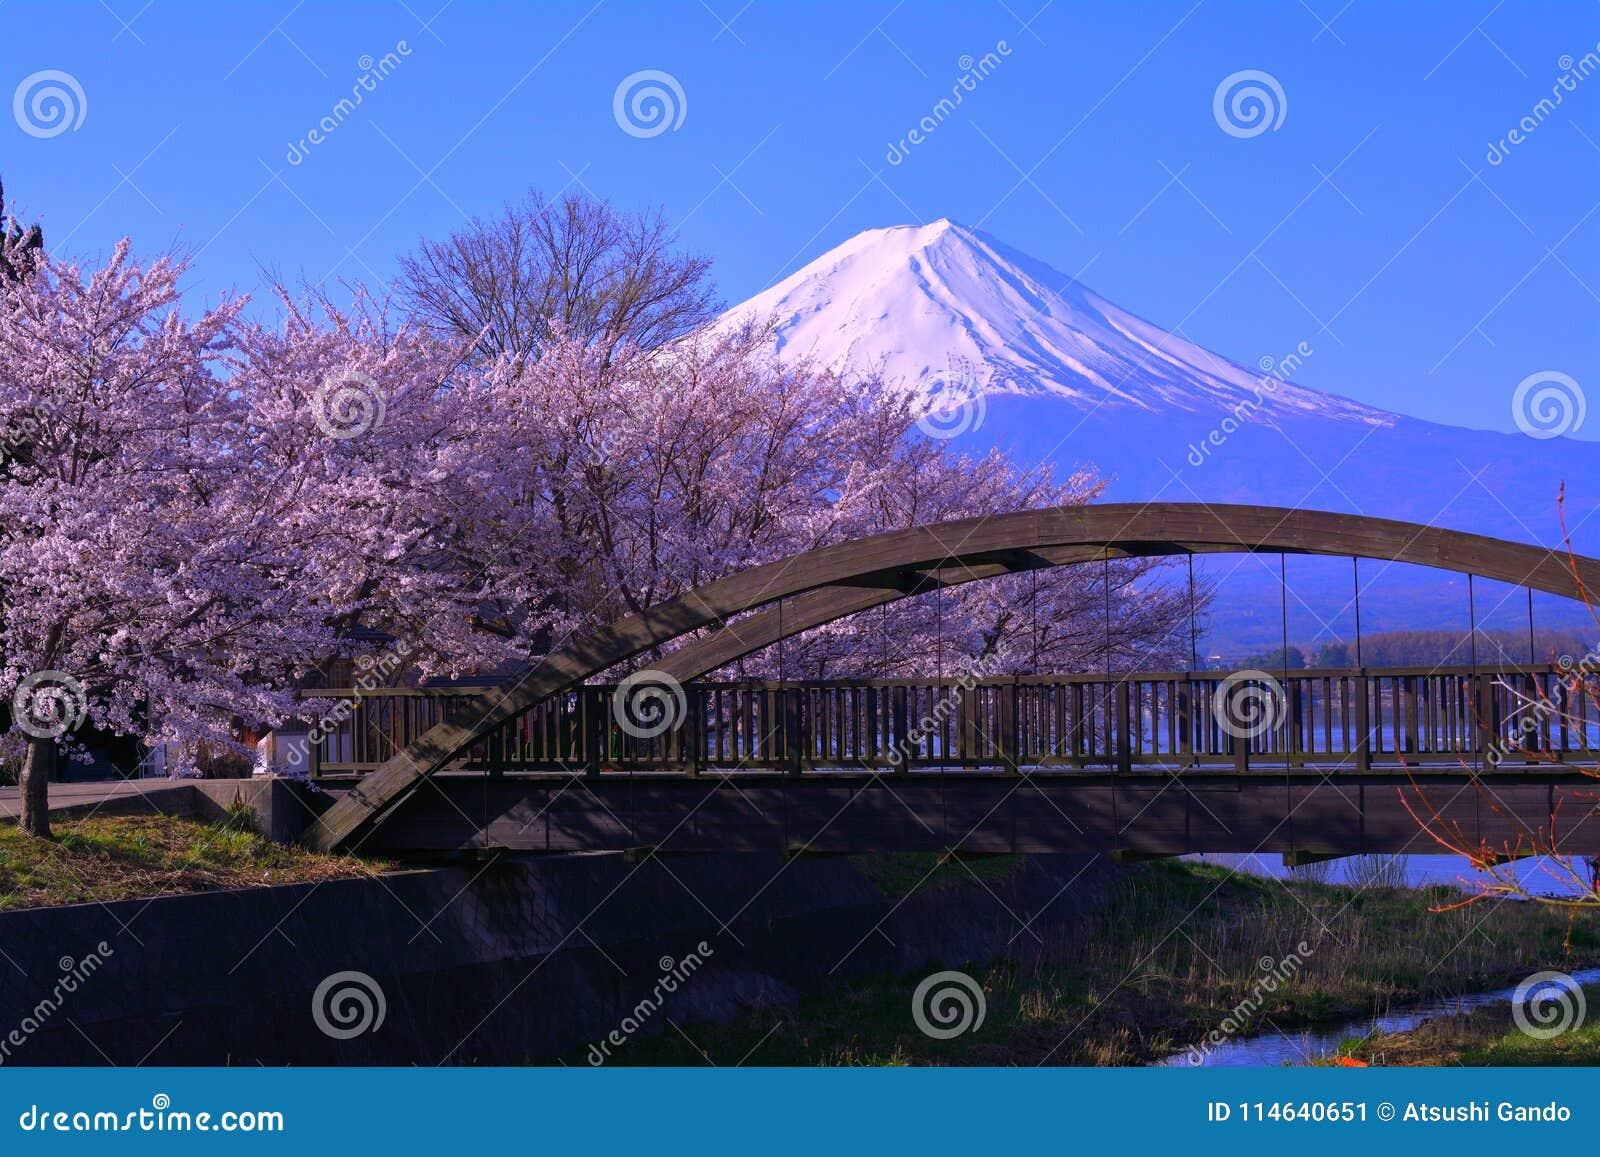 Cherry blossoms and Mt. Fuji from the northern coast of Lake Kawaguchi Japan